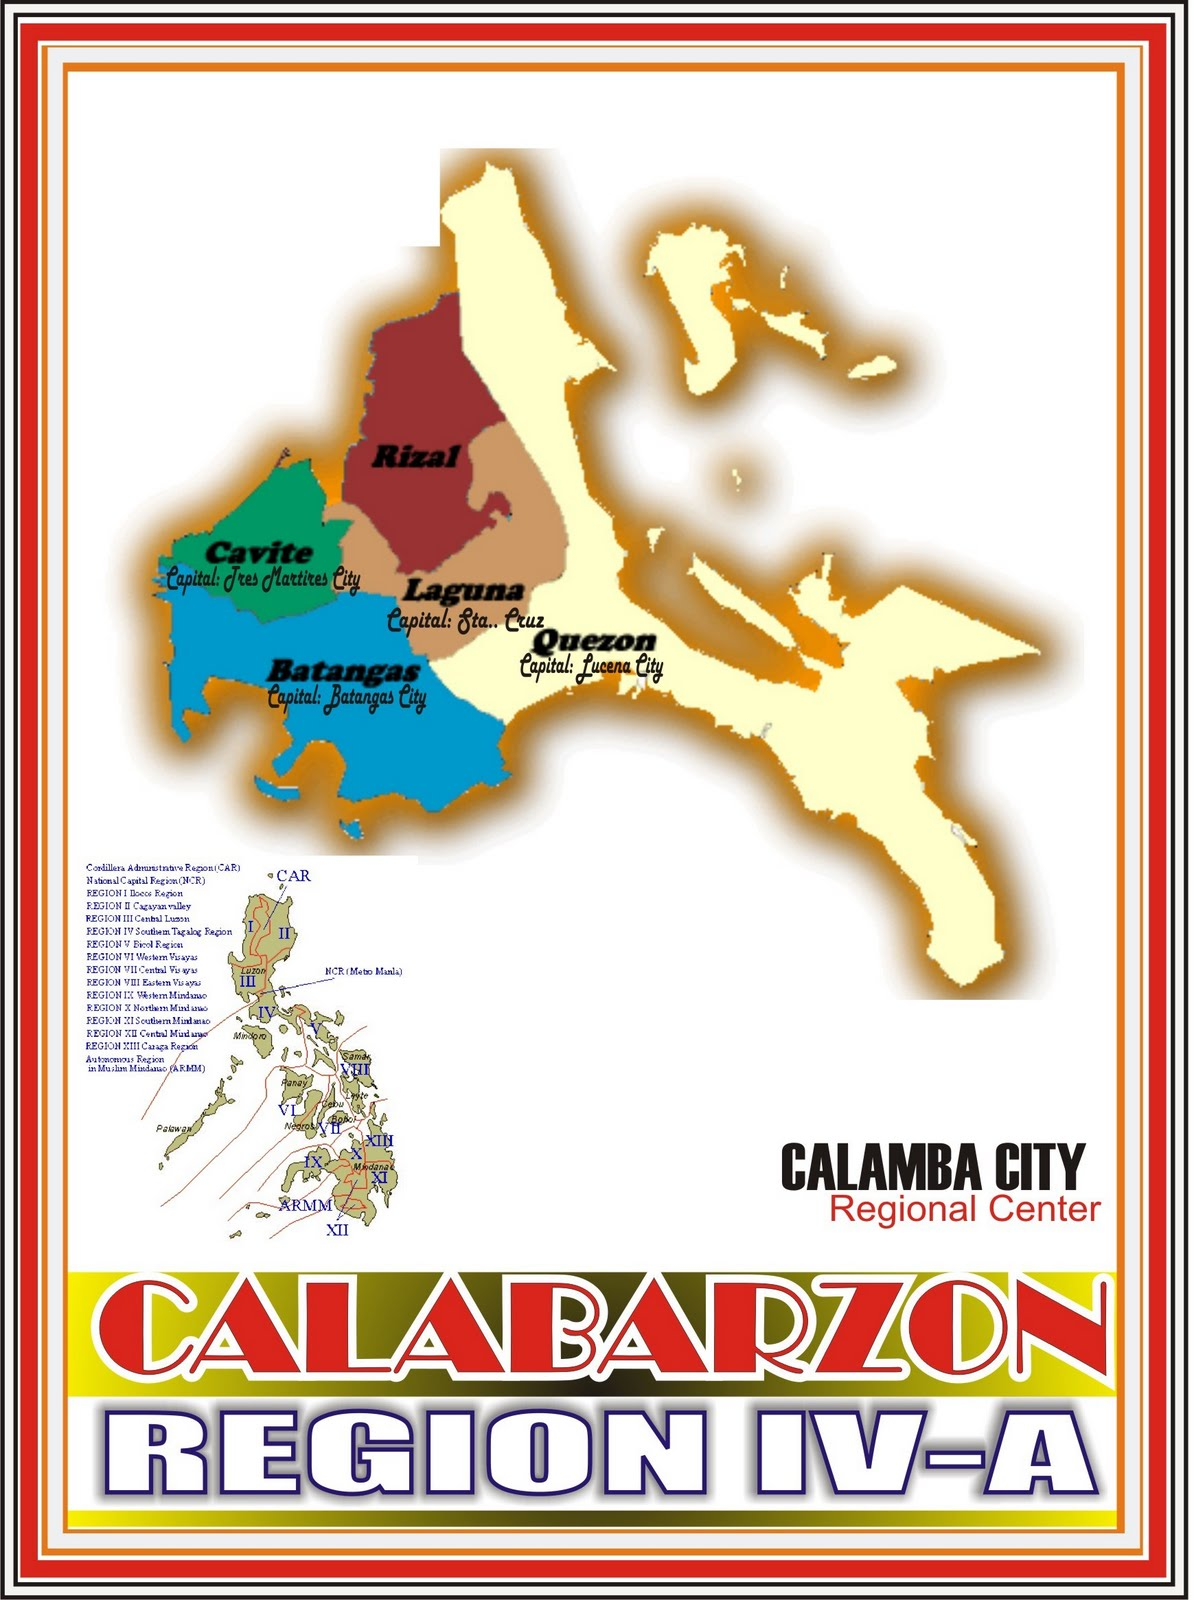 Mellec Computer Center Araling Pinoy: Region 4A - CALABARZON